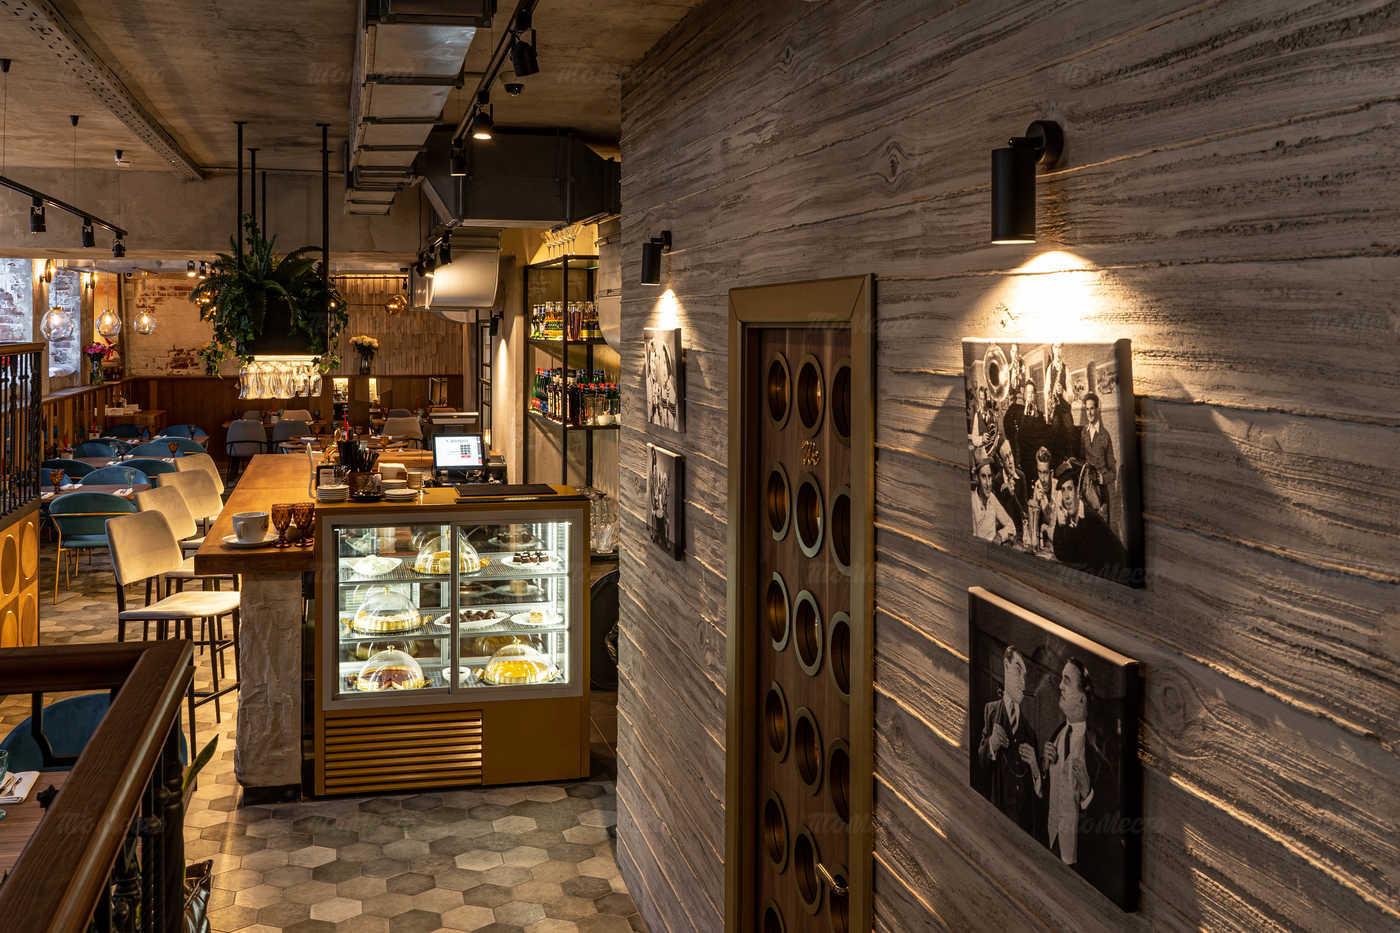 Ресторан IL LETTERATO (Литератор) На Большой Дмитровке фото 6